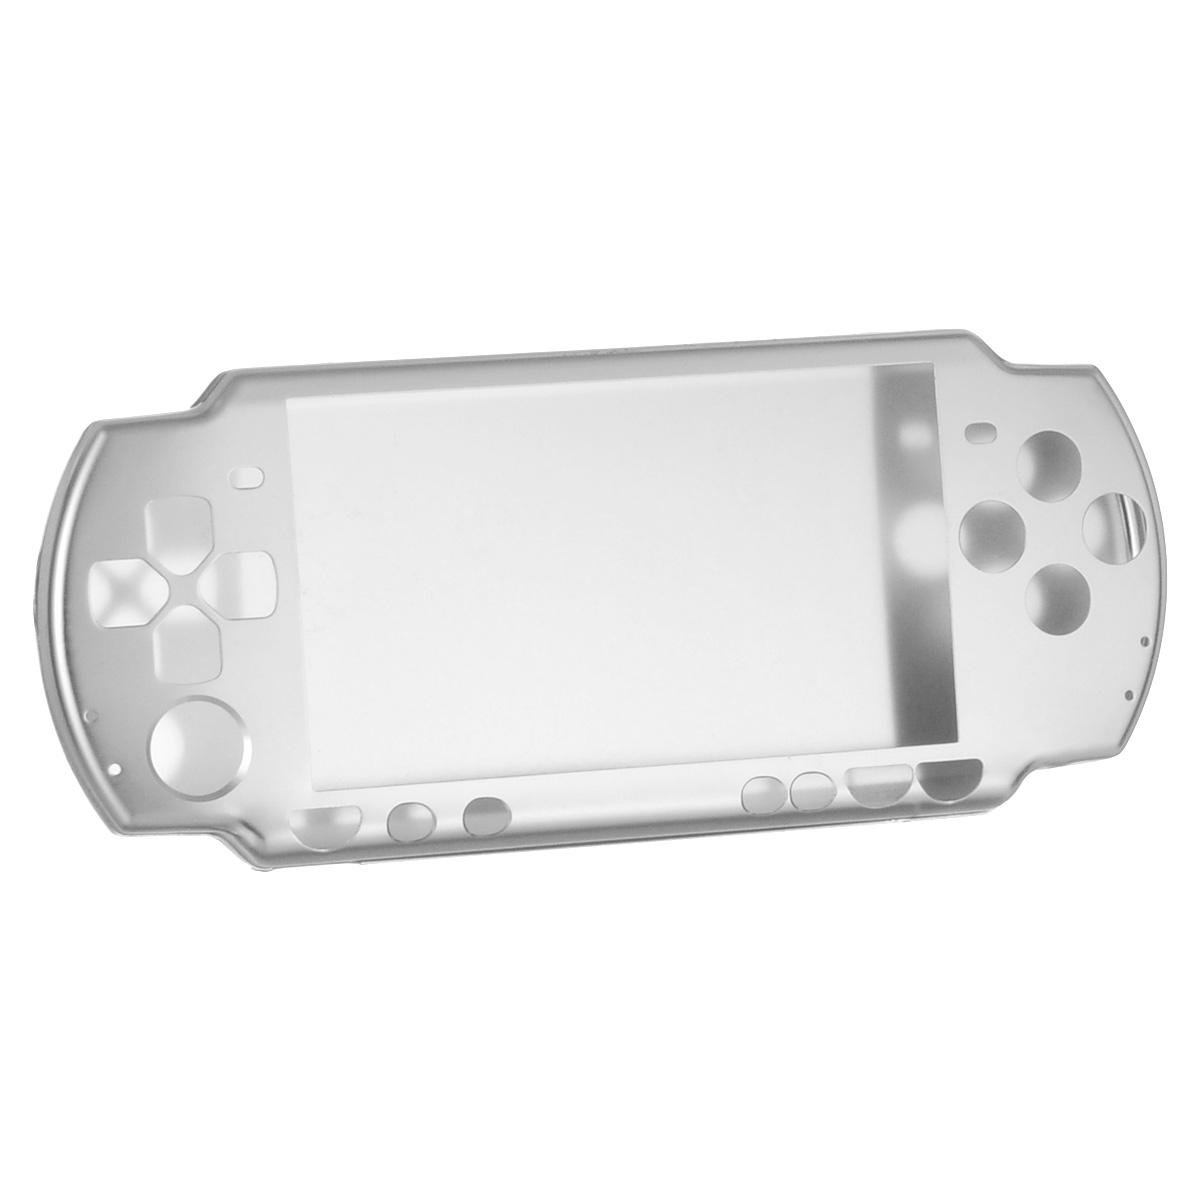 Алюминиевый защитный корпус Game Guru для Sony PSP 2000/3000 (серебряный) portable genca 011 3600mah 3 6v rechargeable battery for sony psp 2000 3000 black